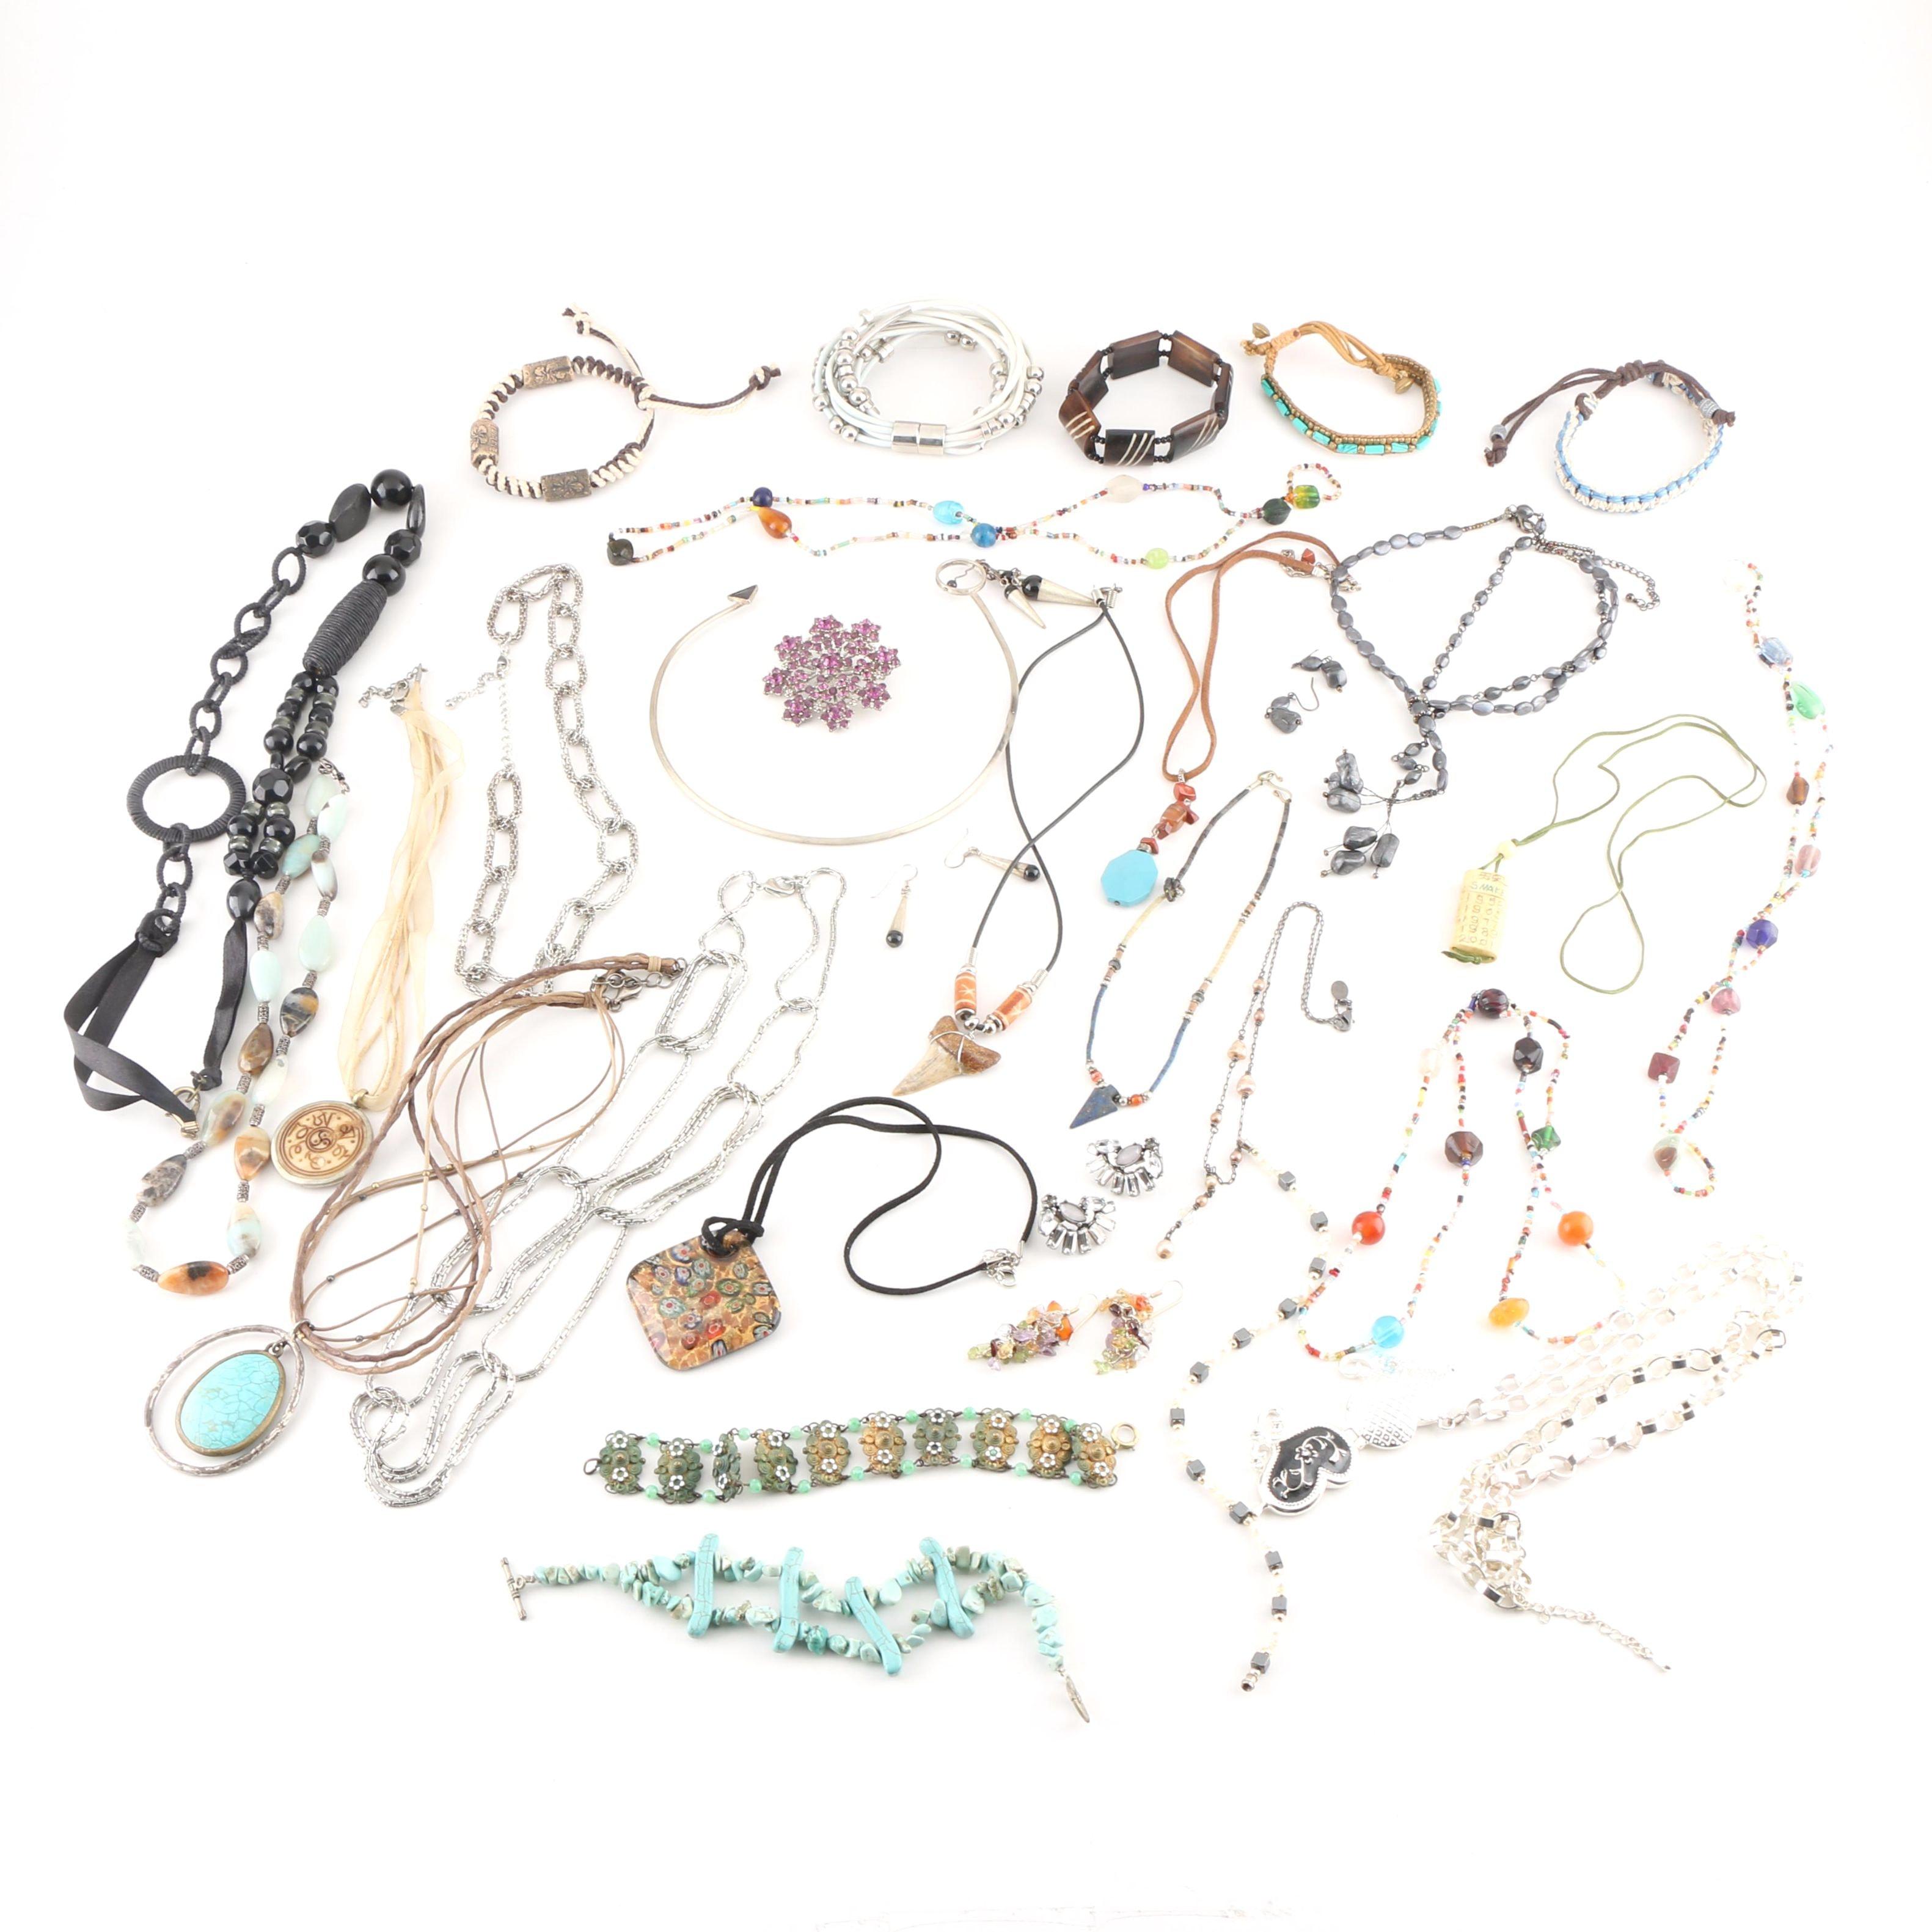 Assortment of Costume Jewelry Including Gemstones